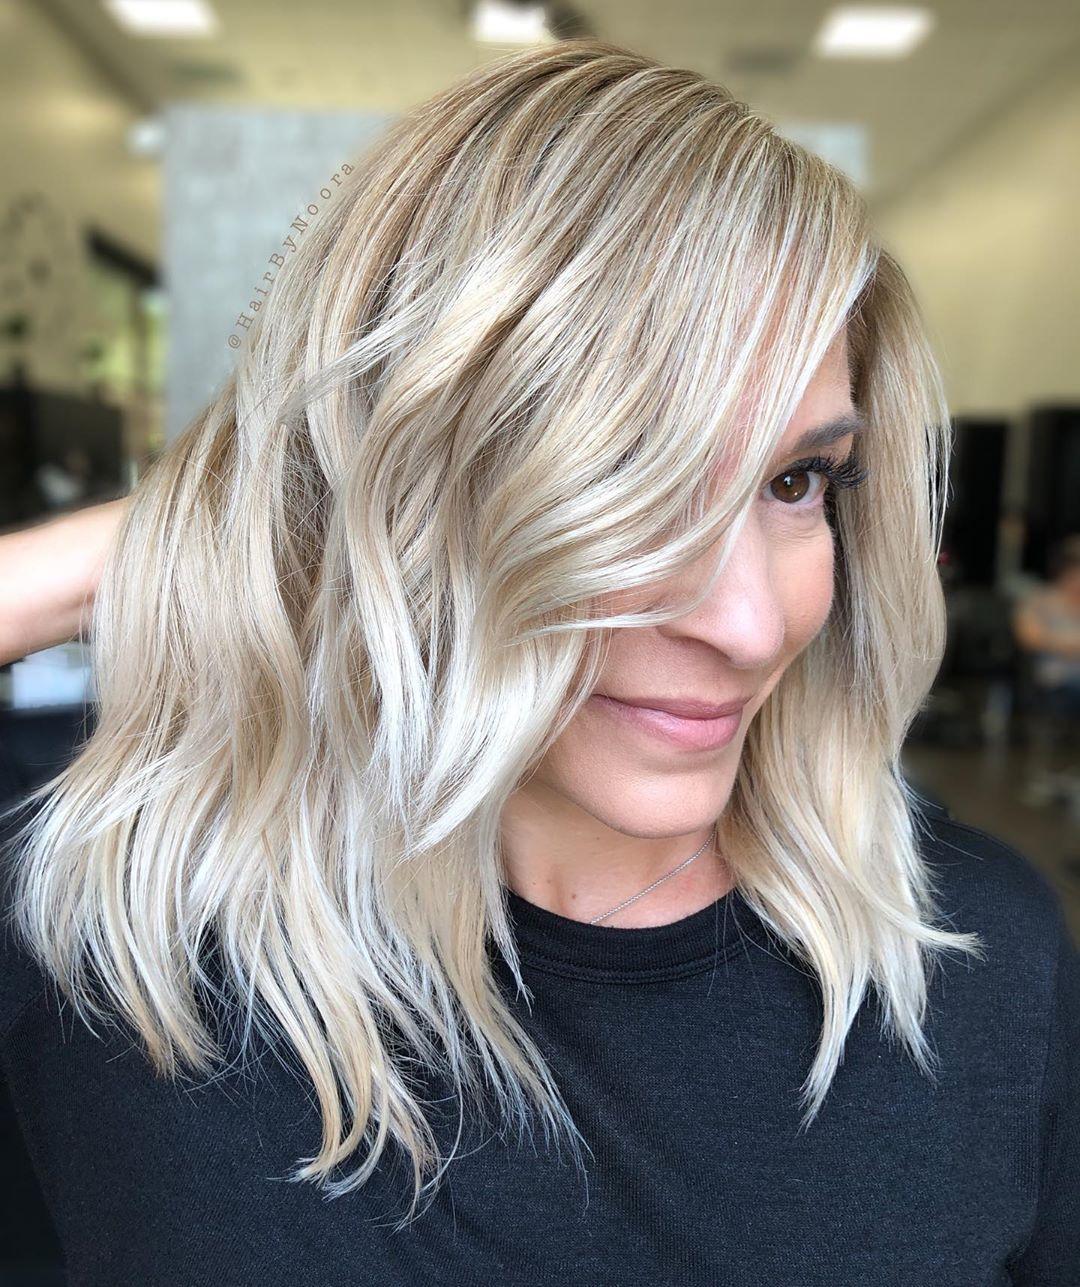 Стрижки после 50 лет на средние волосы 2020 фото 8